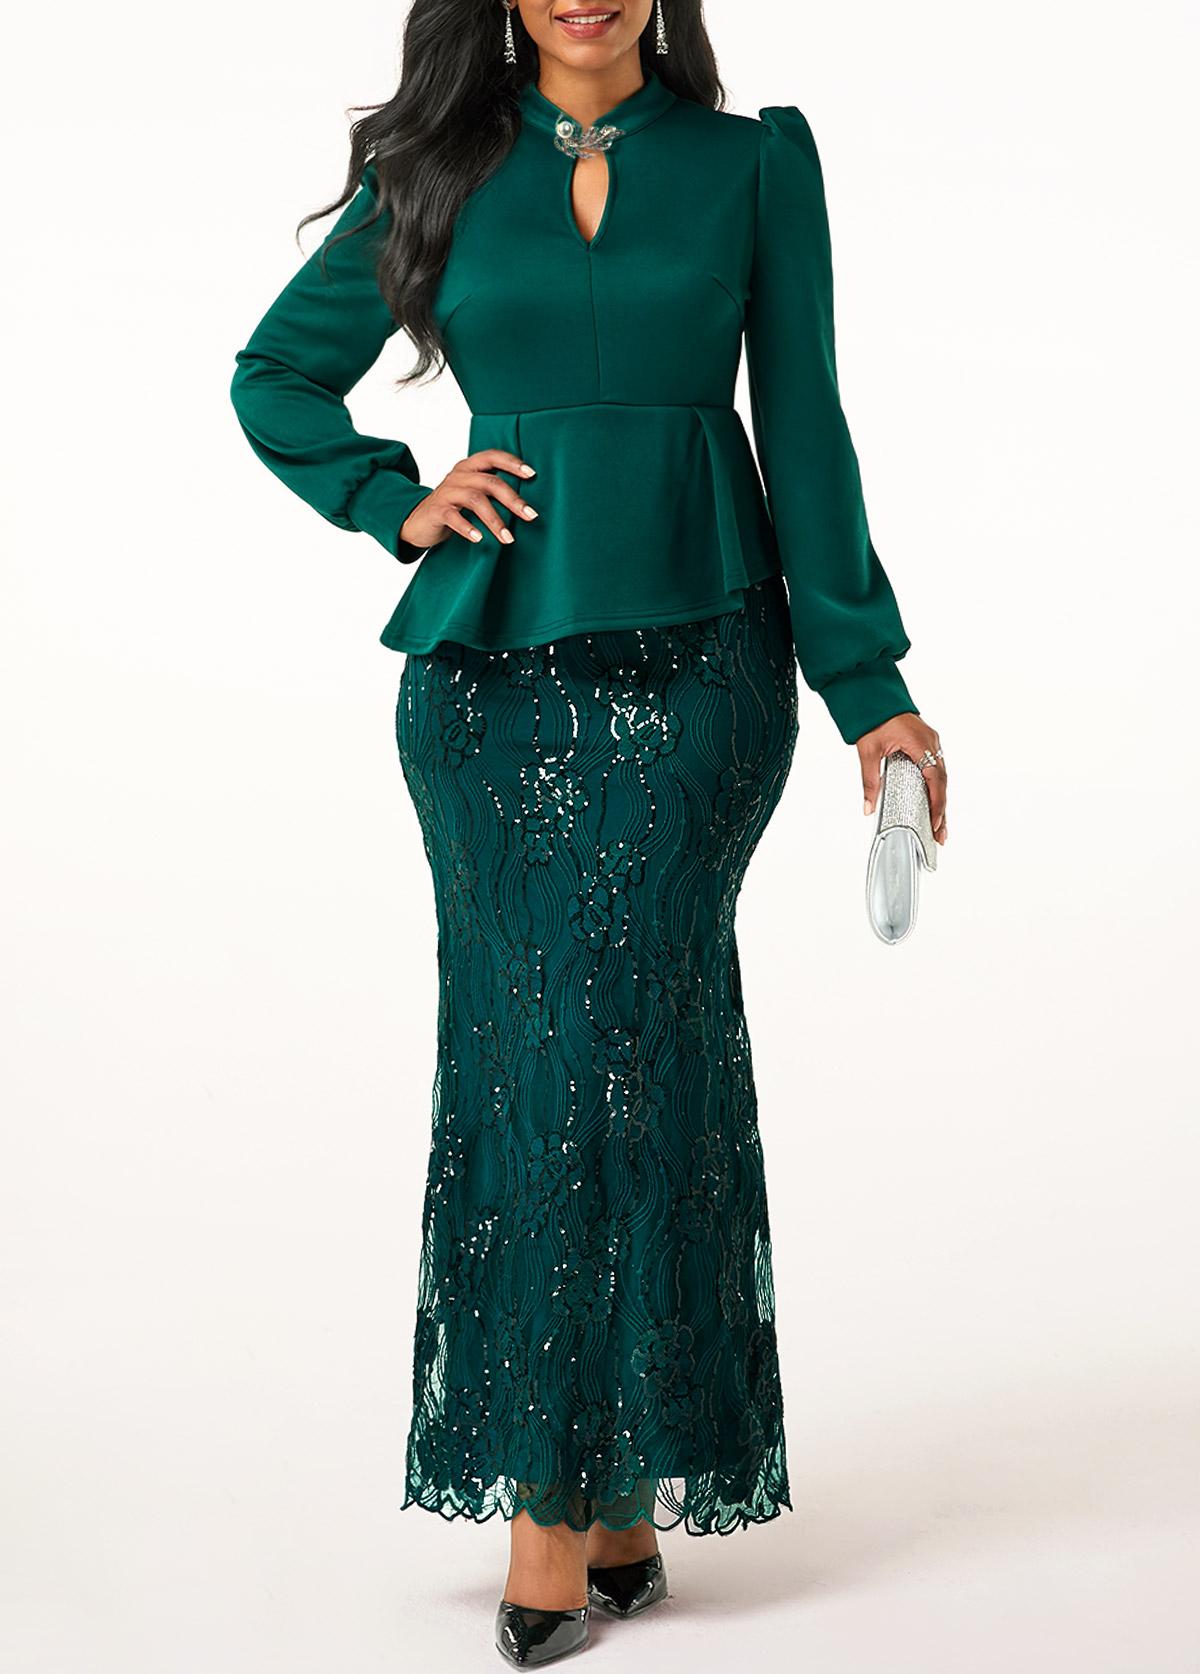 Peplum Waist Long Sleeve Rhinestone Embellished Dress